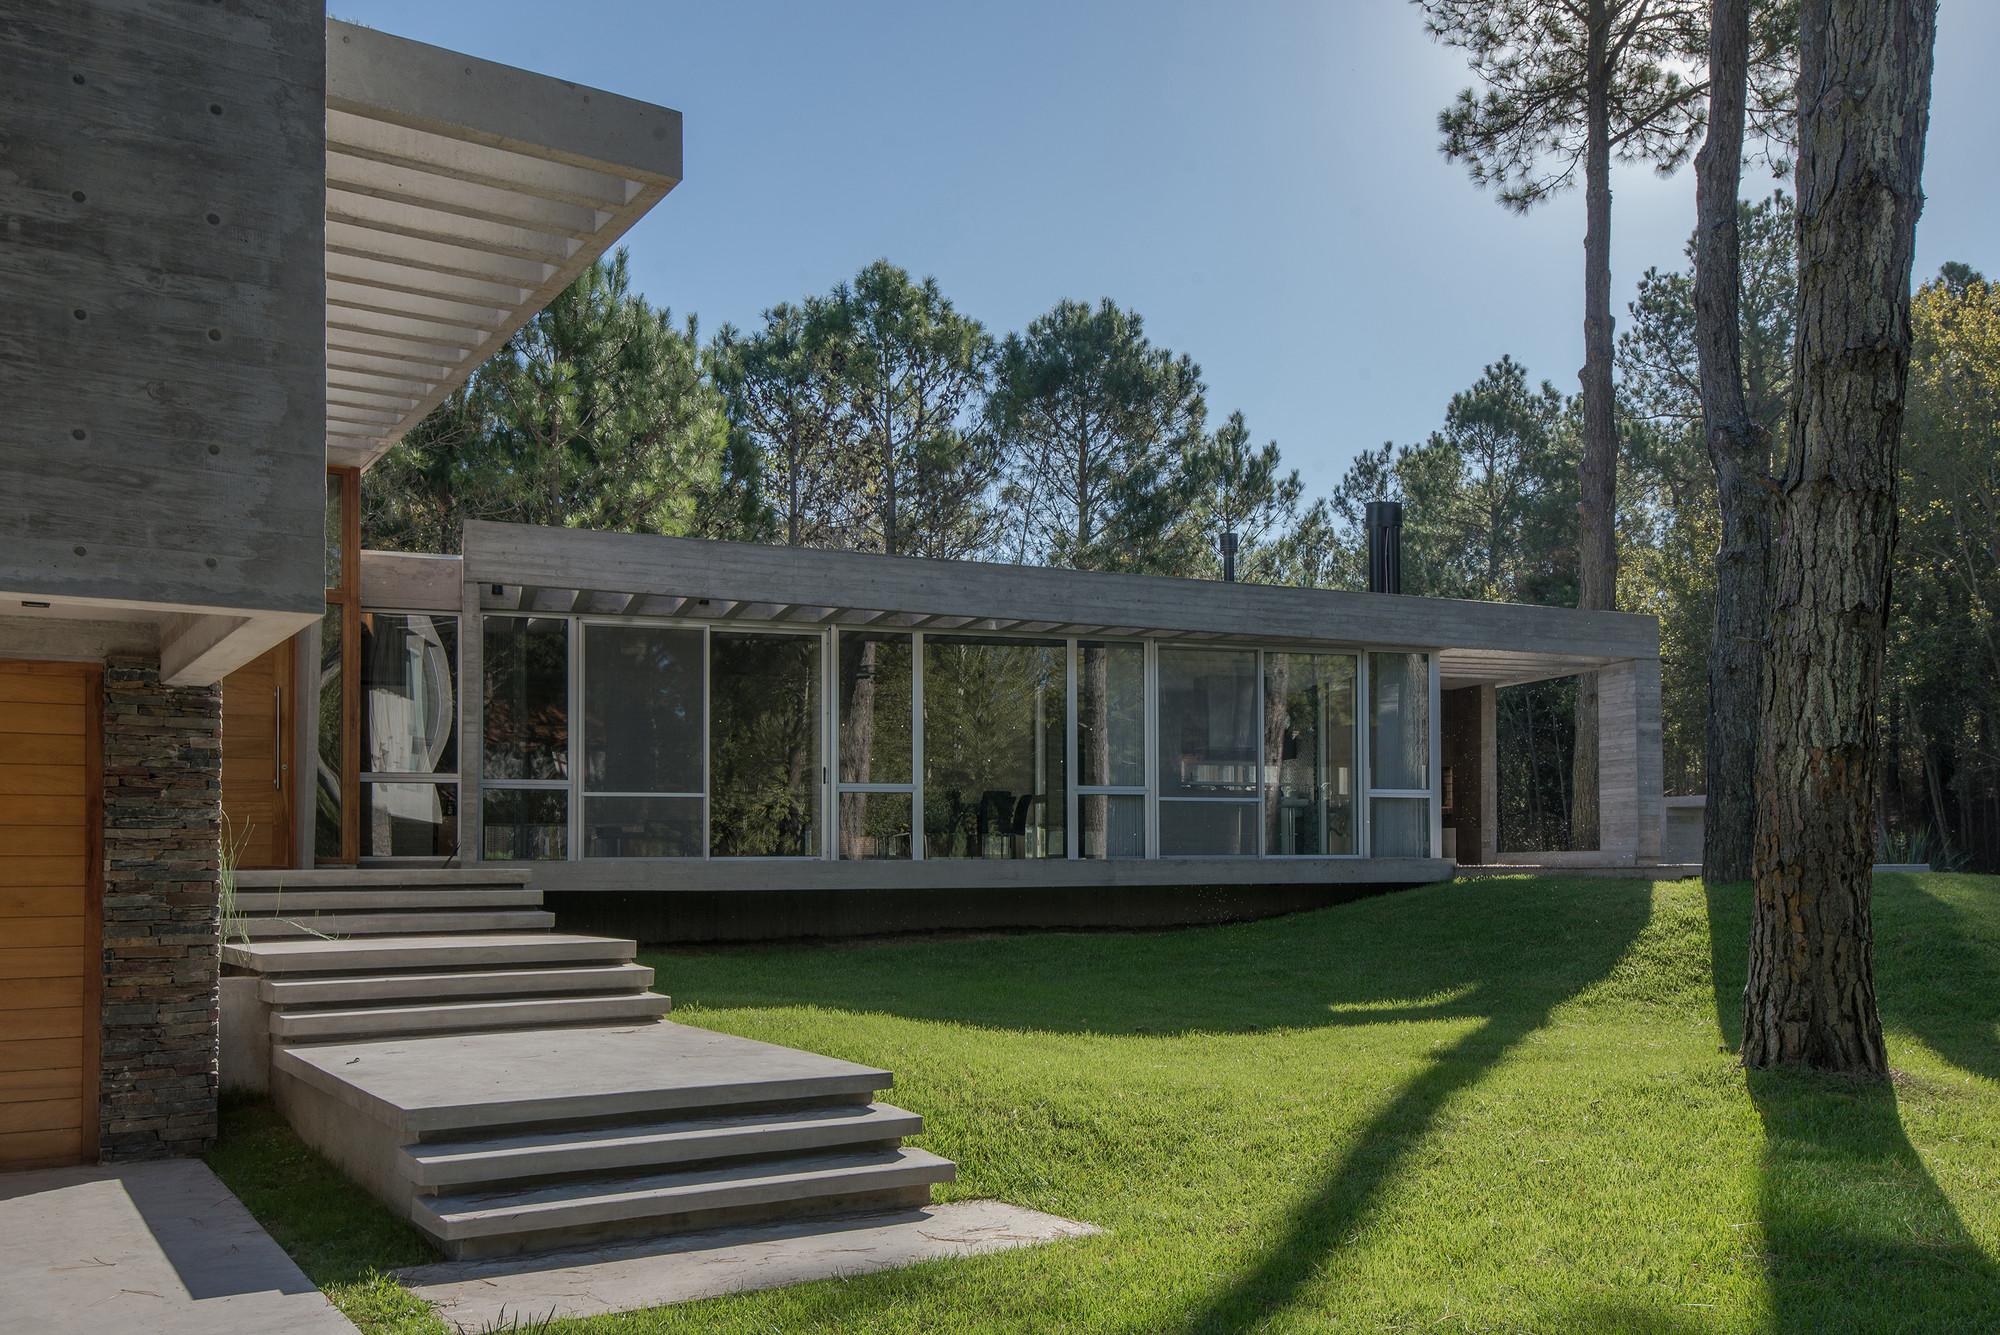 Casa PELICANO  / Estudio Galera, © Diego Medina – dcfotografia